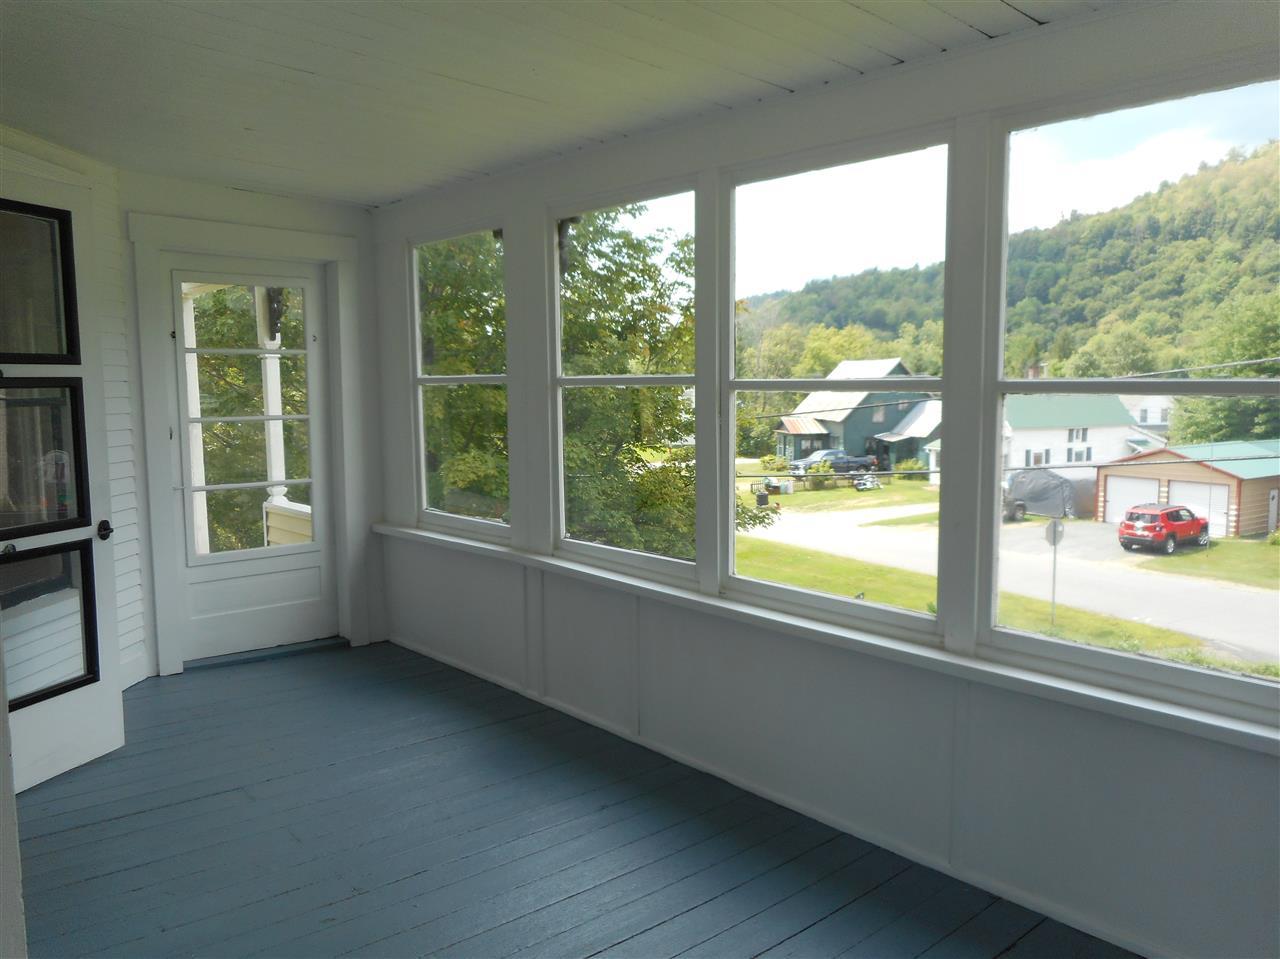 Vermont-Real-Estate-4651704-2